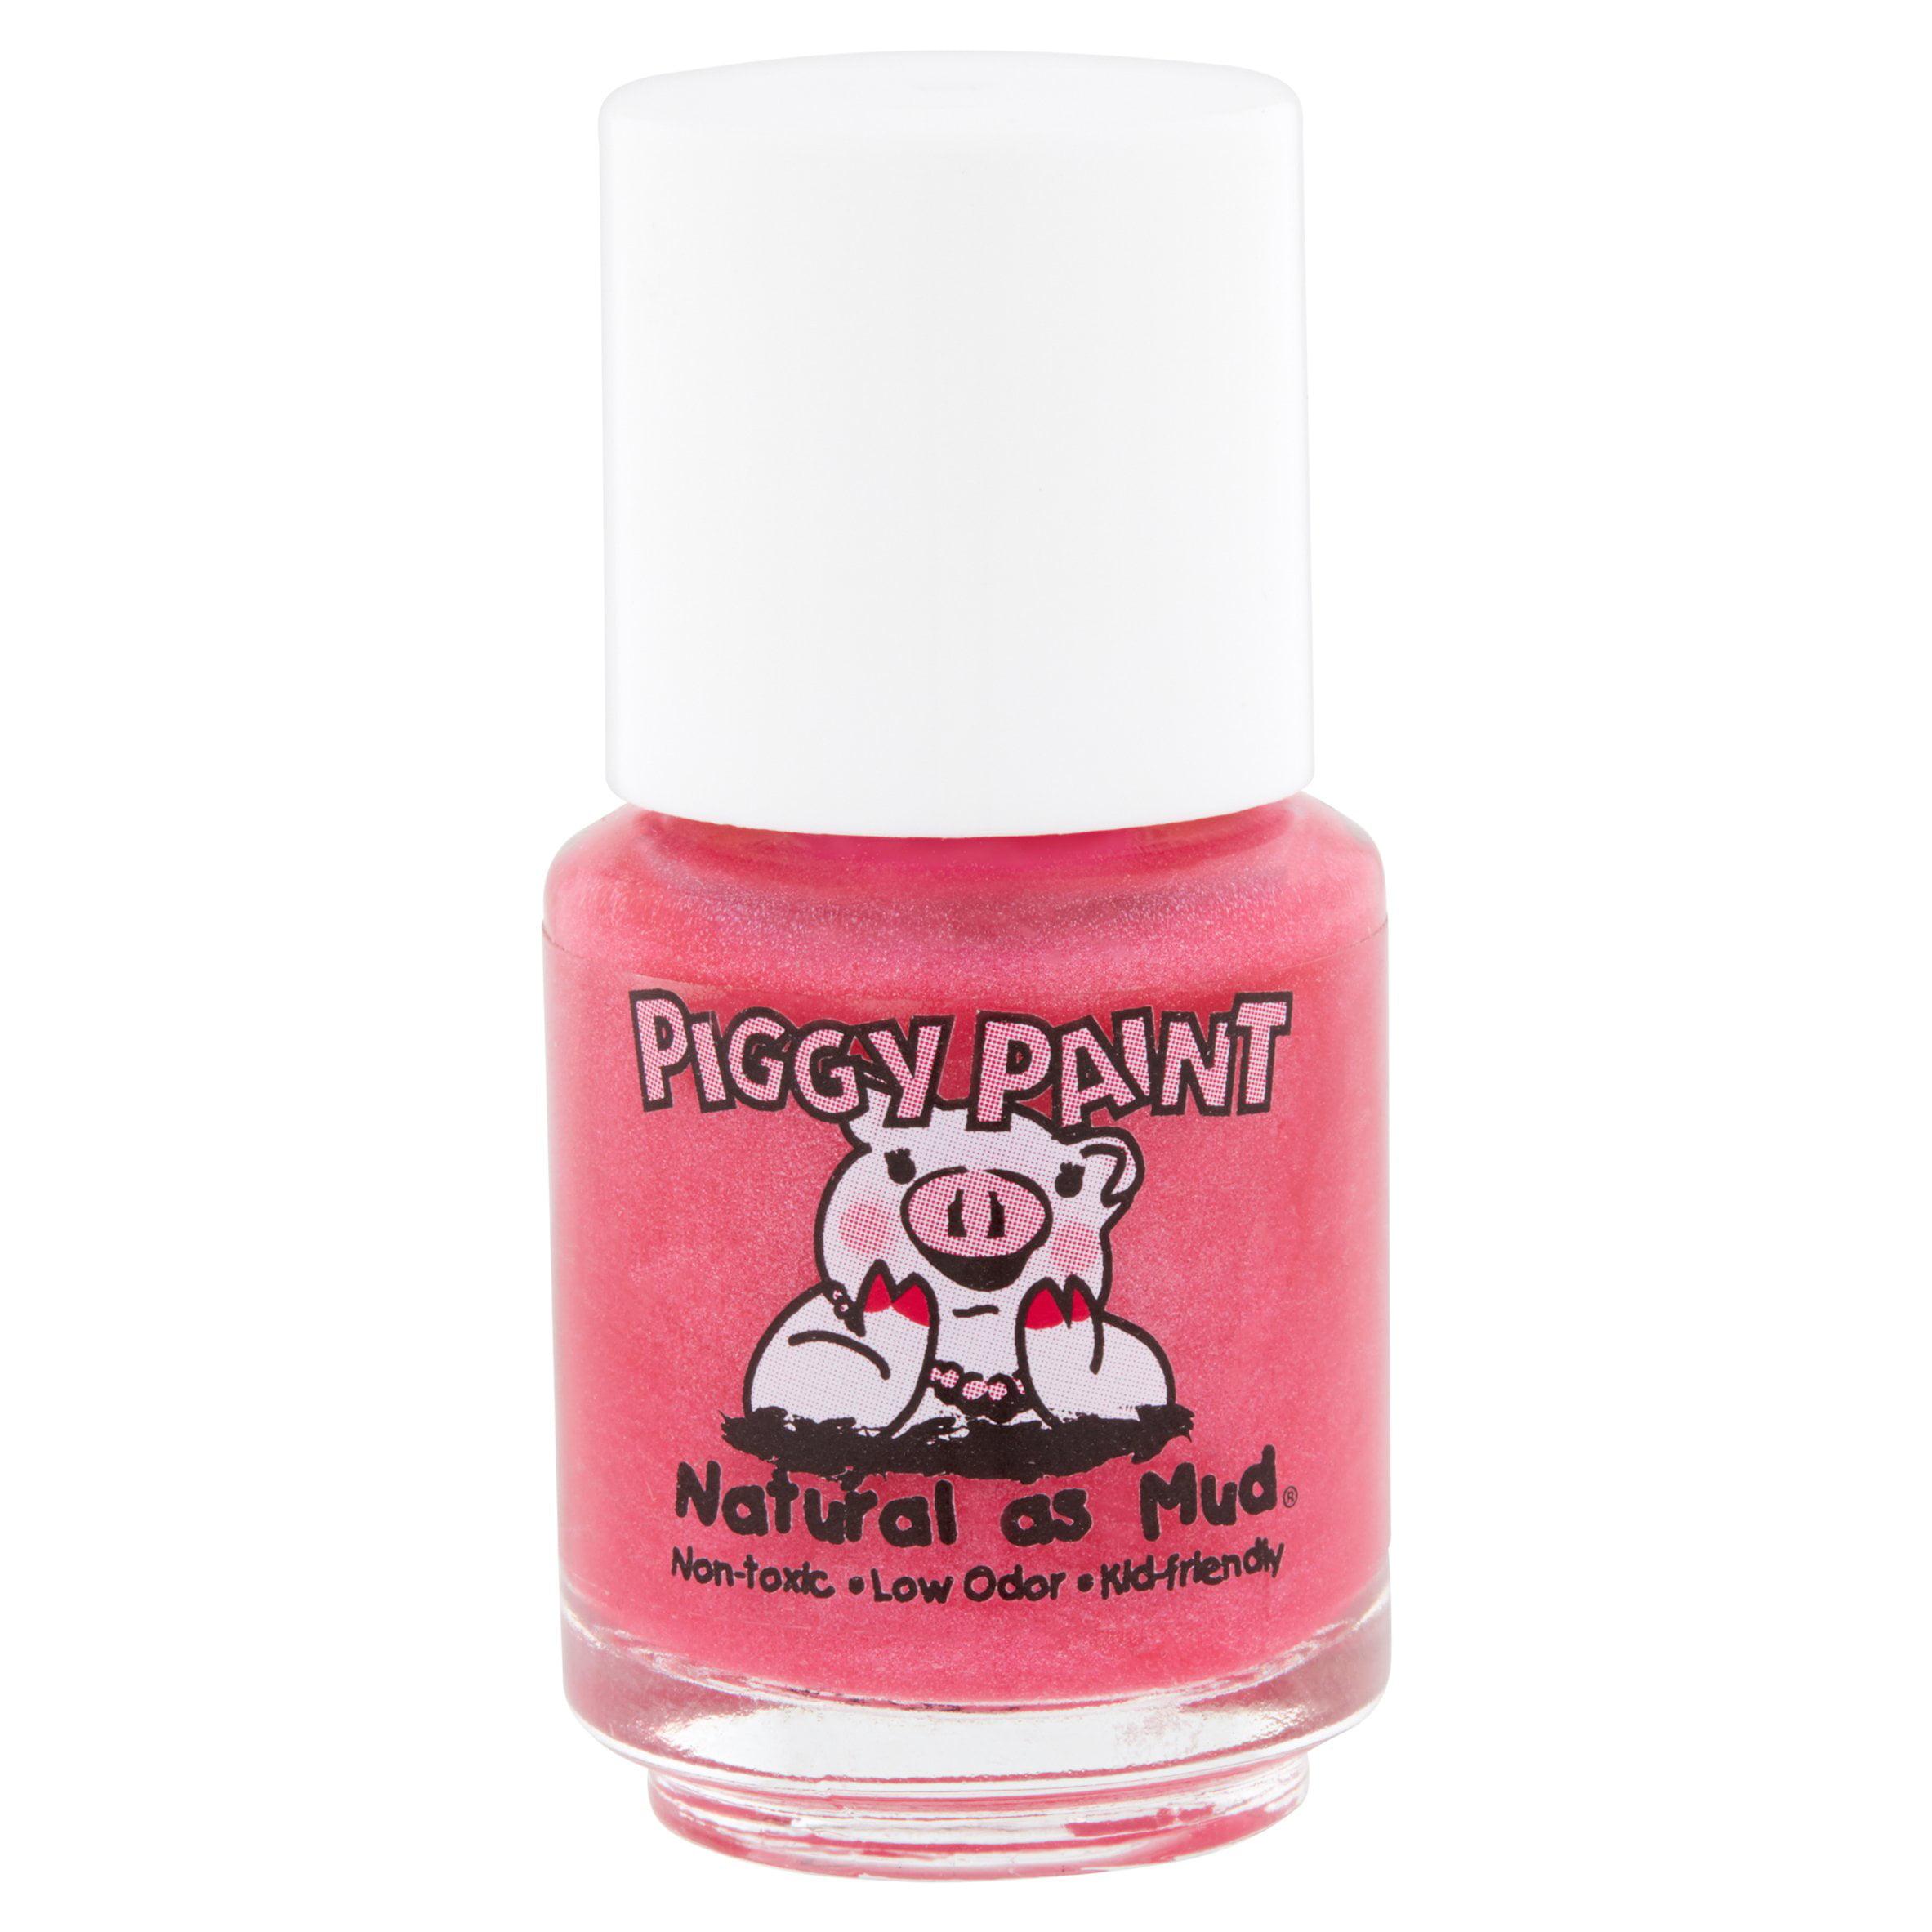 Piggy Paint Nail Polish, Forever Fancy, 0.25 fl oz - Walmart.com